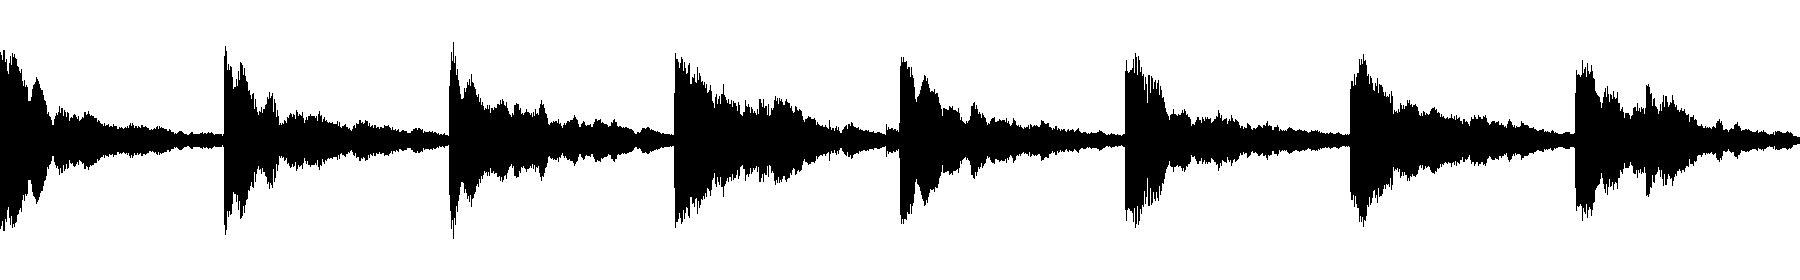 dts chordlp 09 gm wet